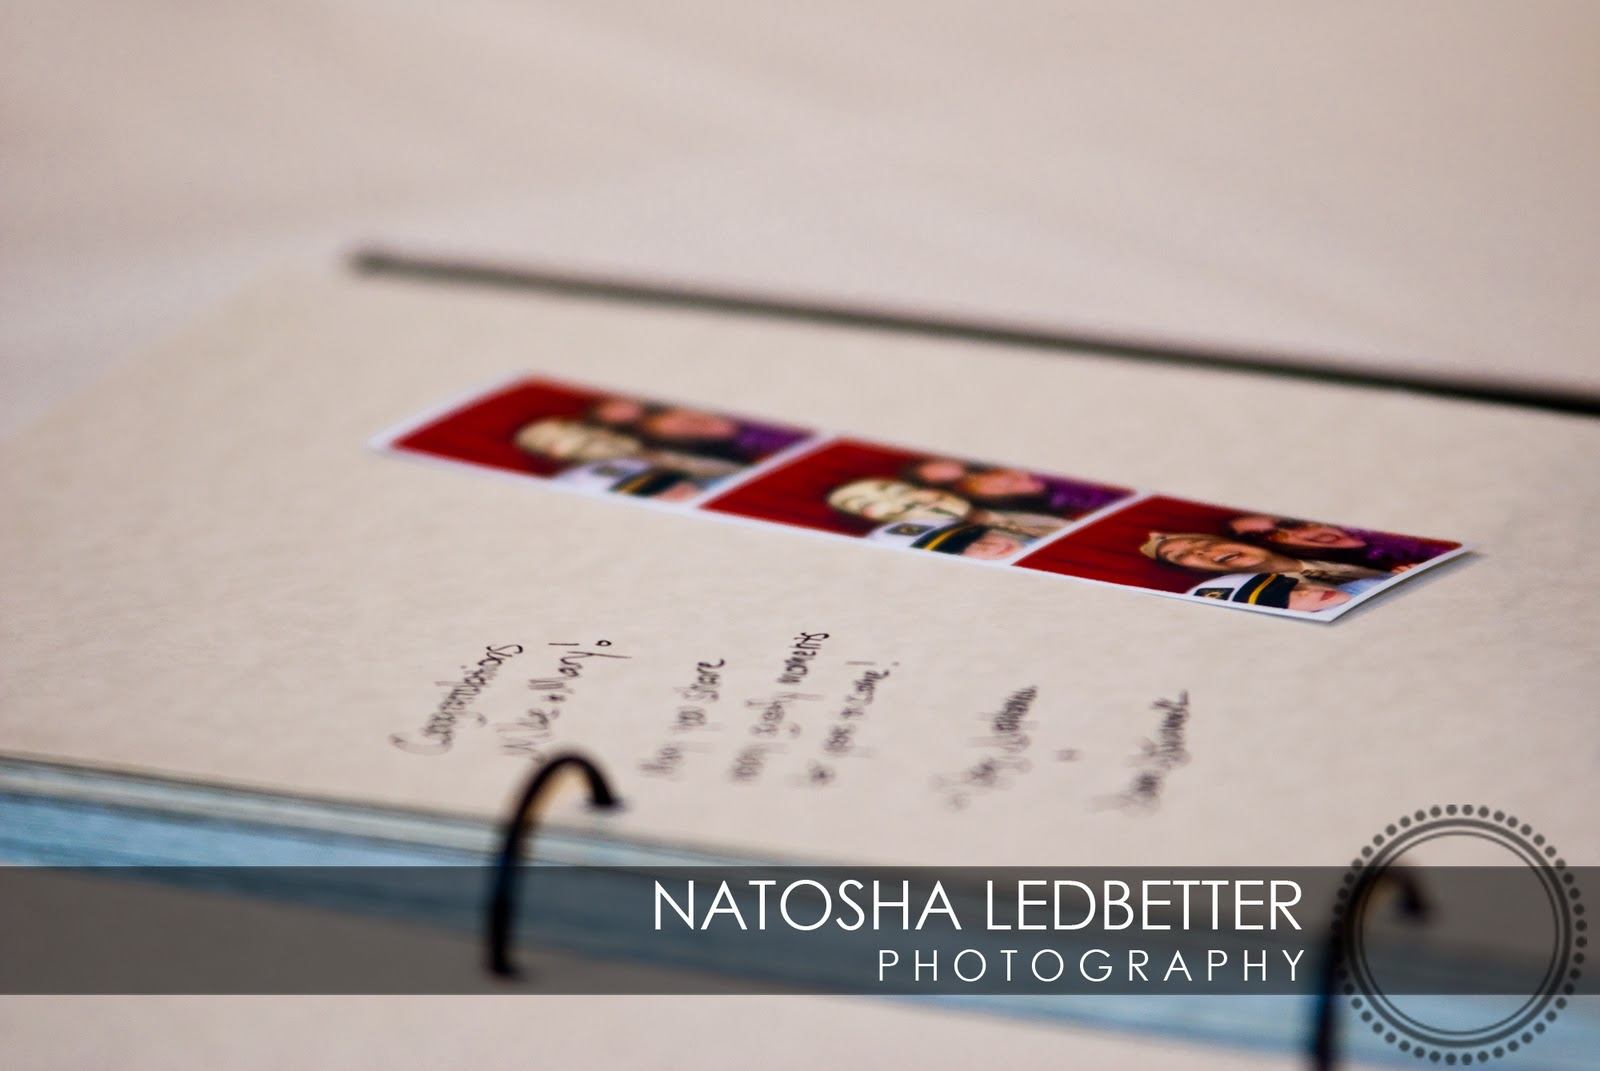 http://1.bp.blogspot.com/_na8ceJEw0cM/TNlCCJvq11I/AAAAAAAAAg4/3zgy4aezImo/s1600/2010.10.23_Natosha_Ledbetter_Photography_Wedding_Mary%252BMichael-179.jpg